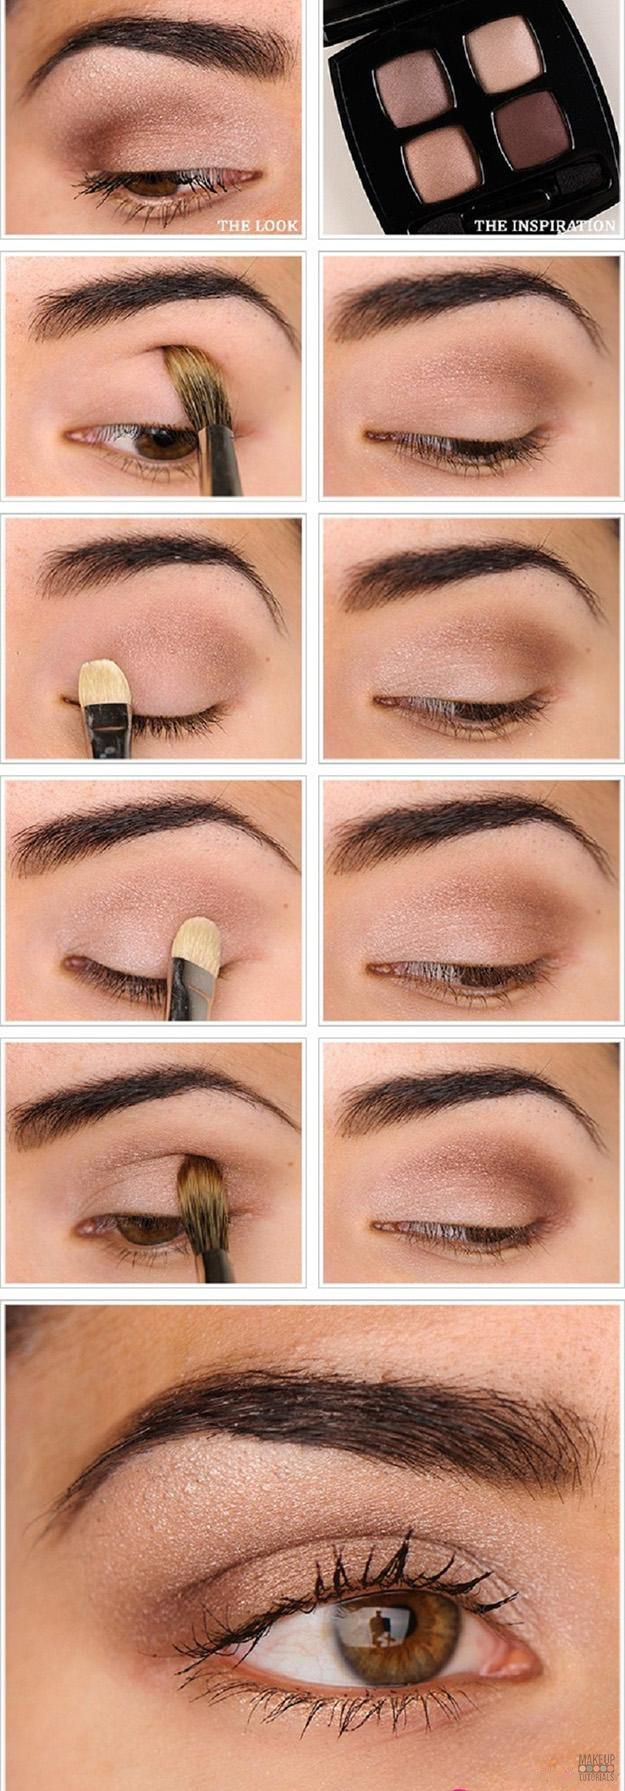 Eyeshadow Tutorials: Everyday Makeup. DIY tutorial for natural look, perfect mak...